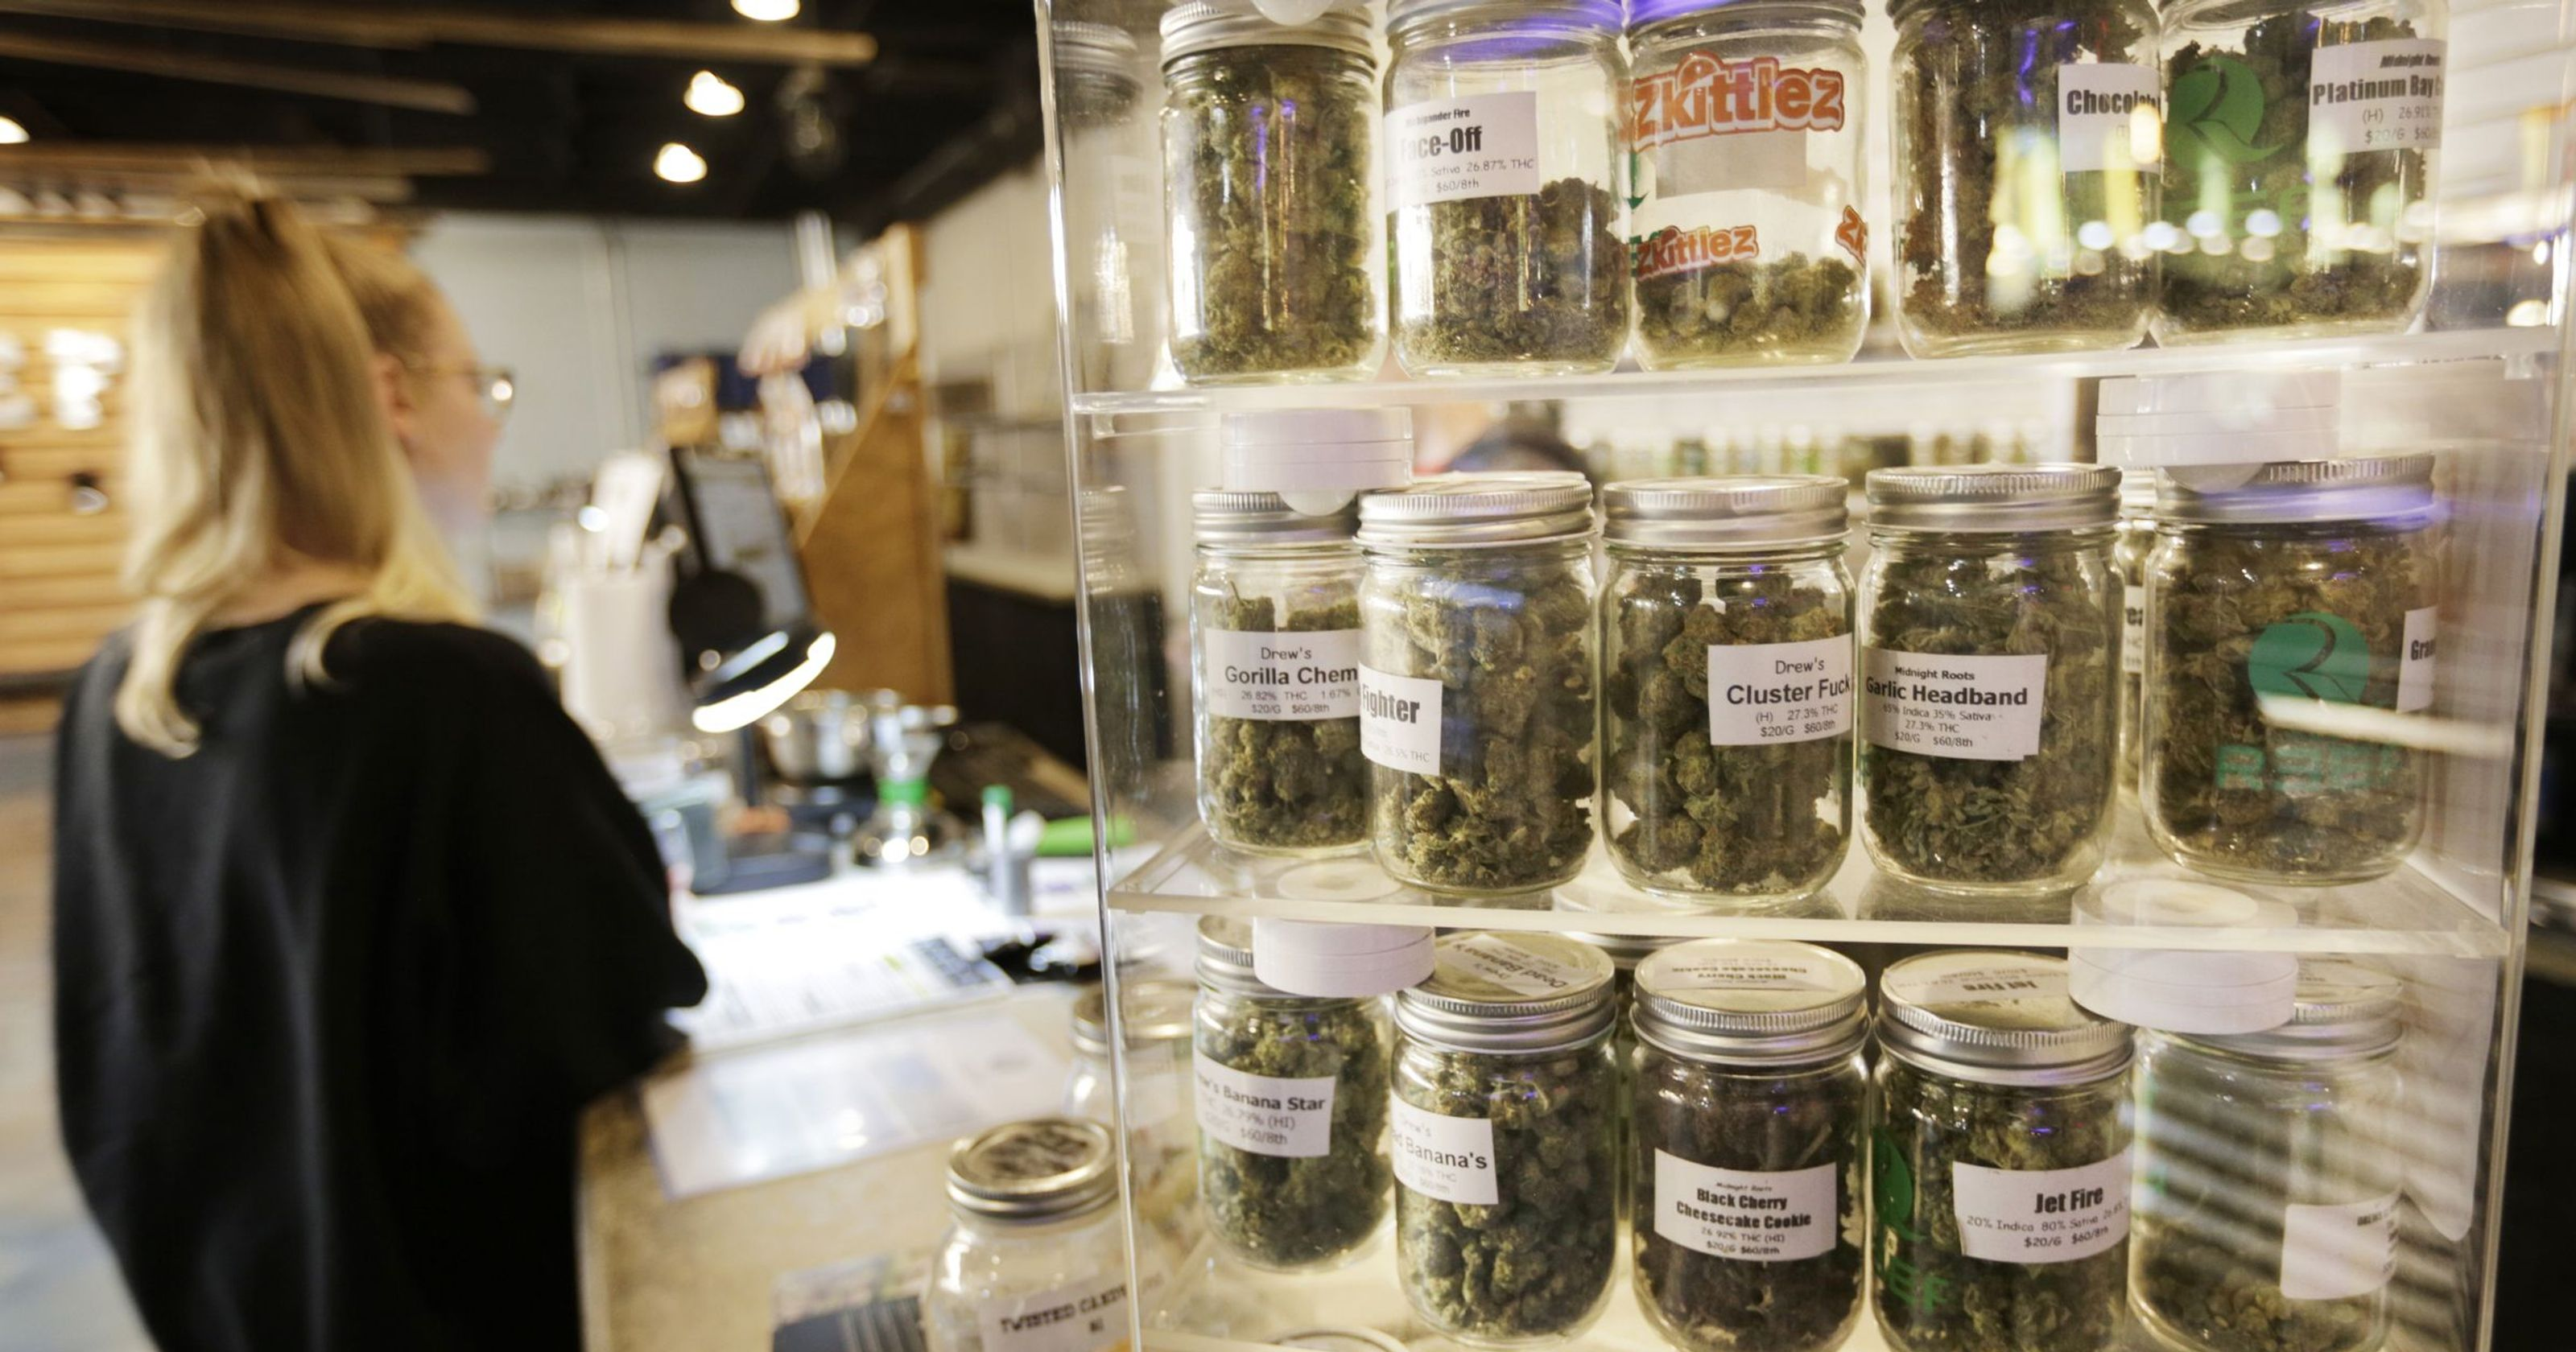 Use Marijuana for medical purposes